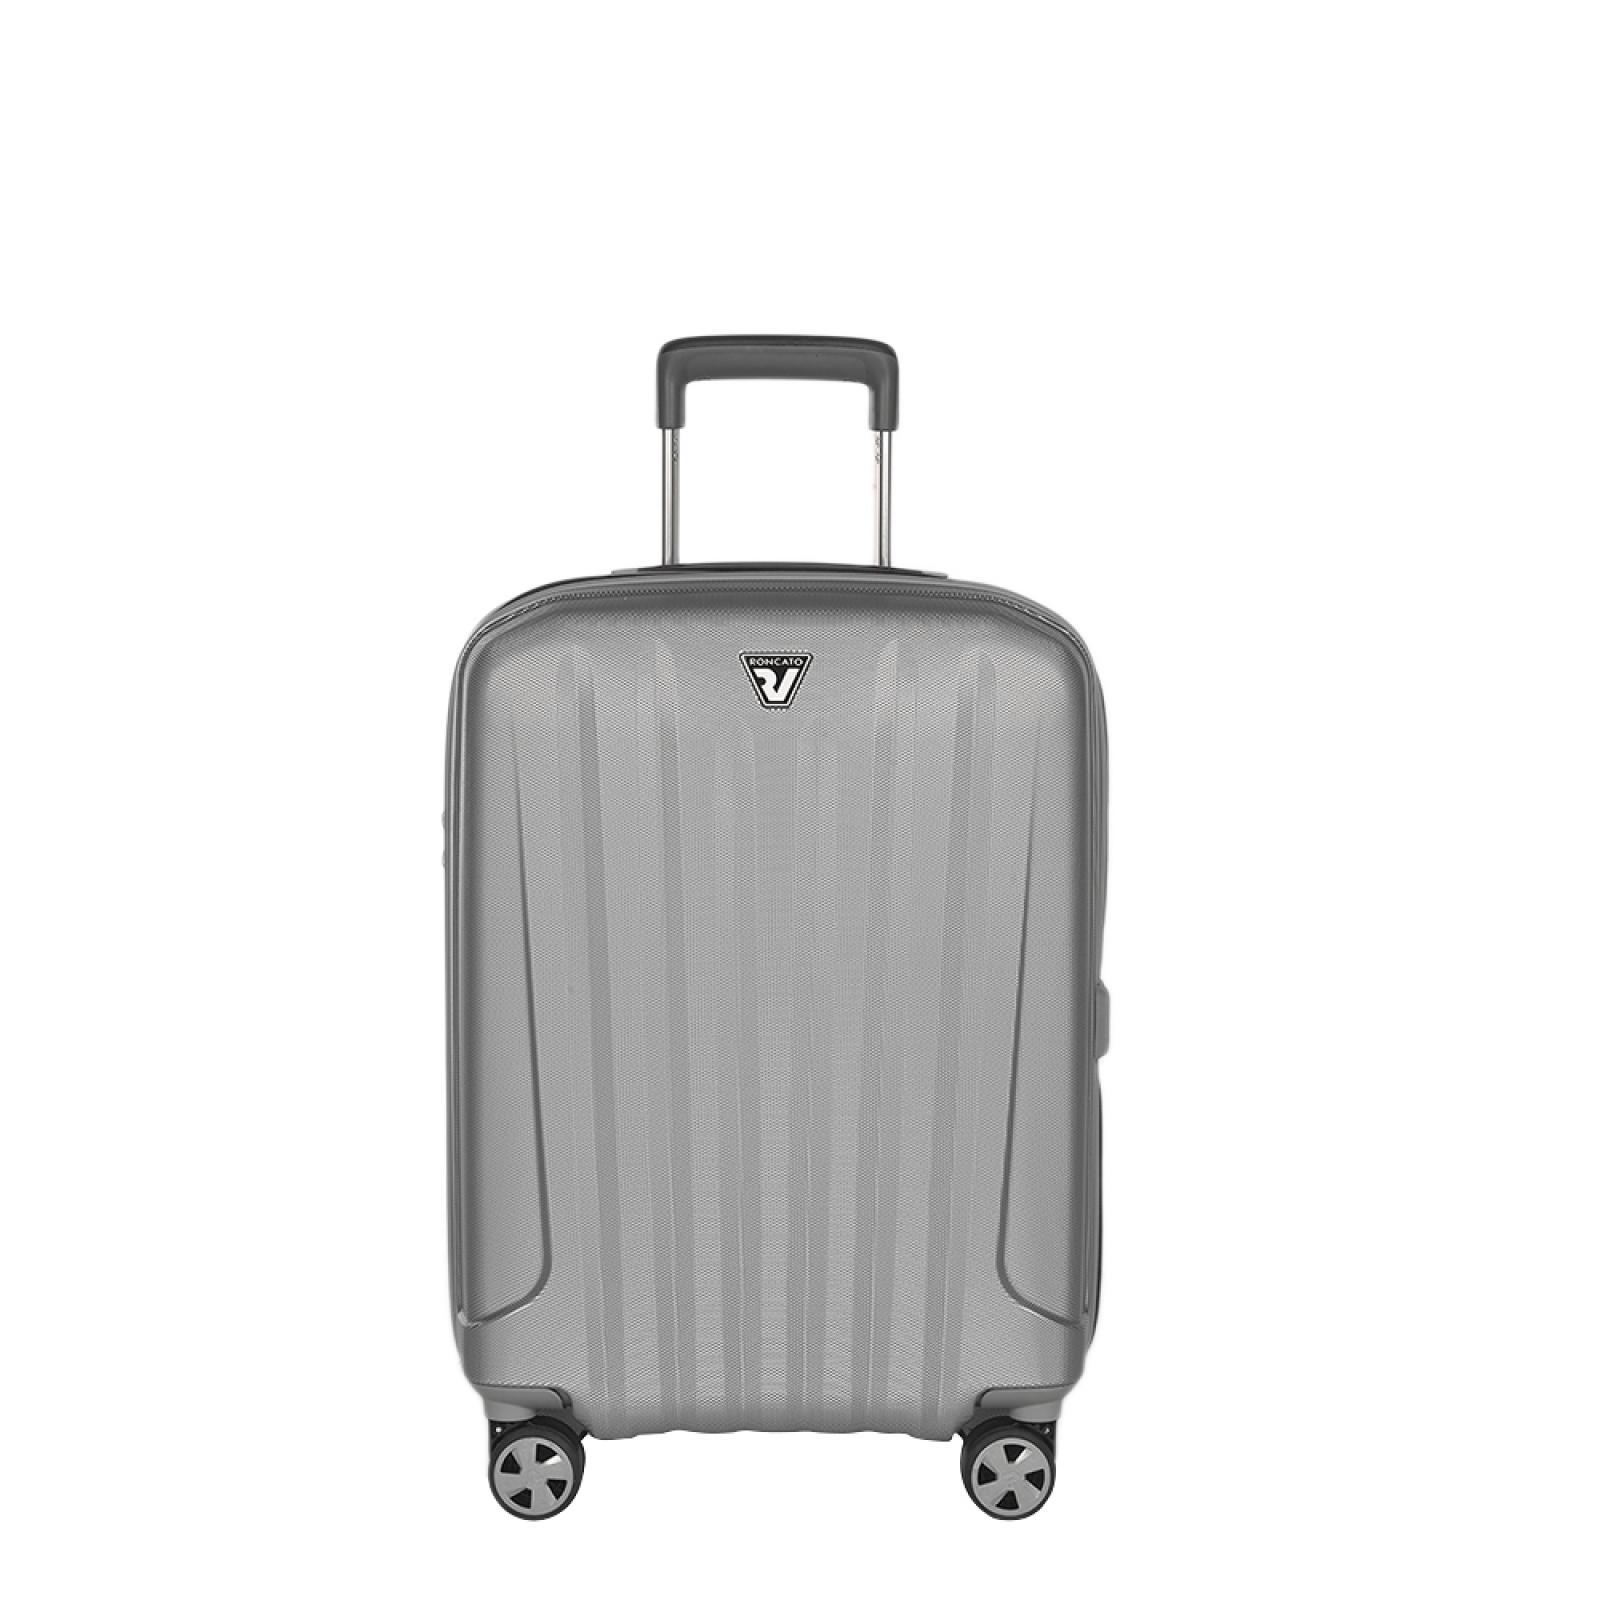 Cabin Case Unica Spinner 55 cm-SILVER-UN